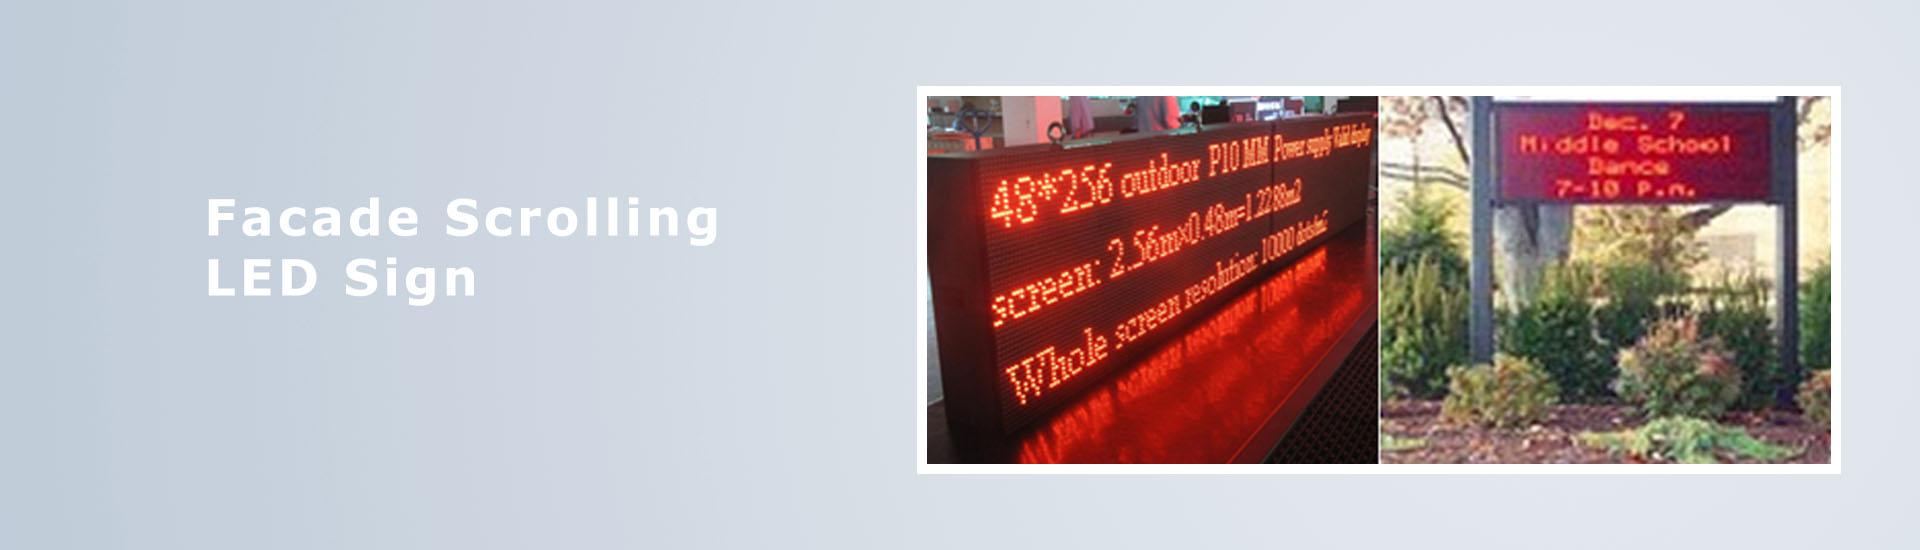 digital-LED-Facade-Scrolling